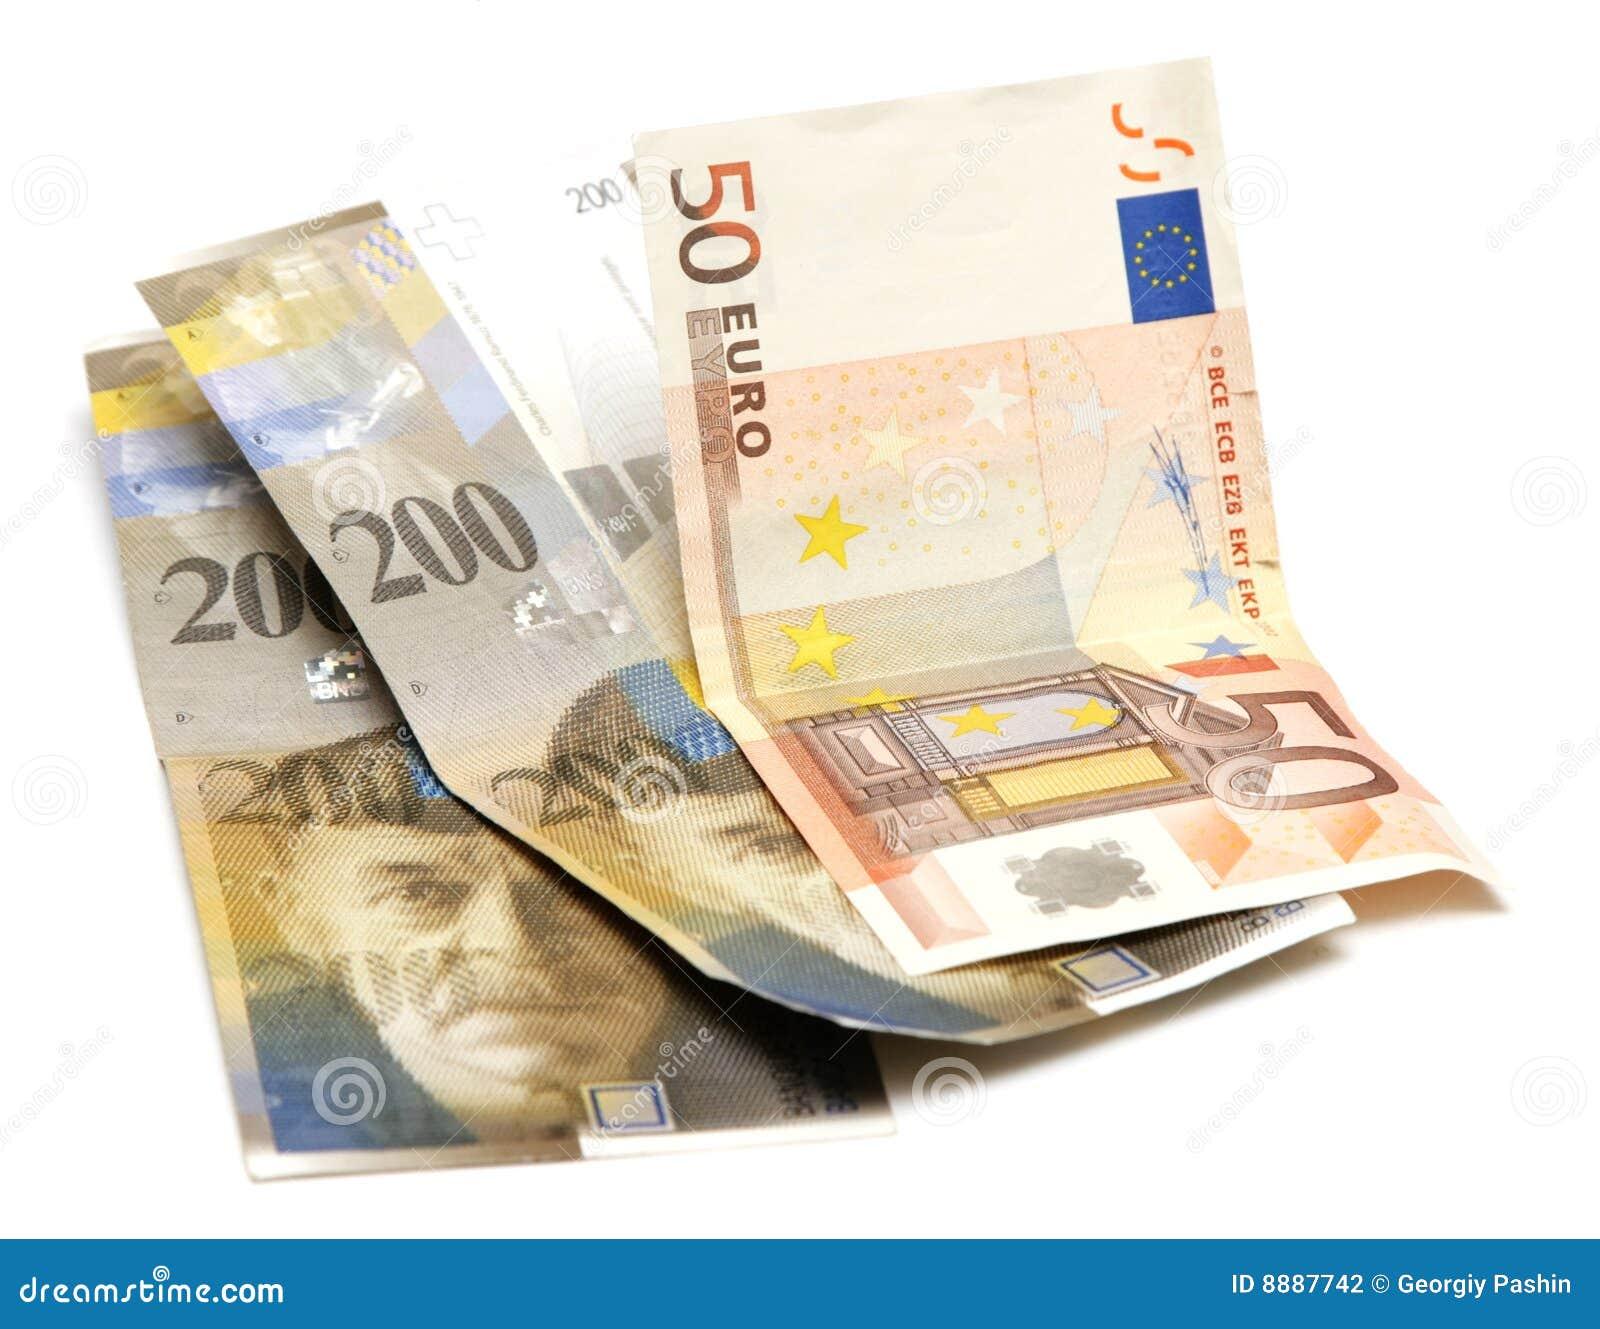 200 Chf Euro